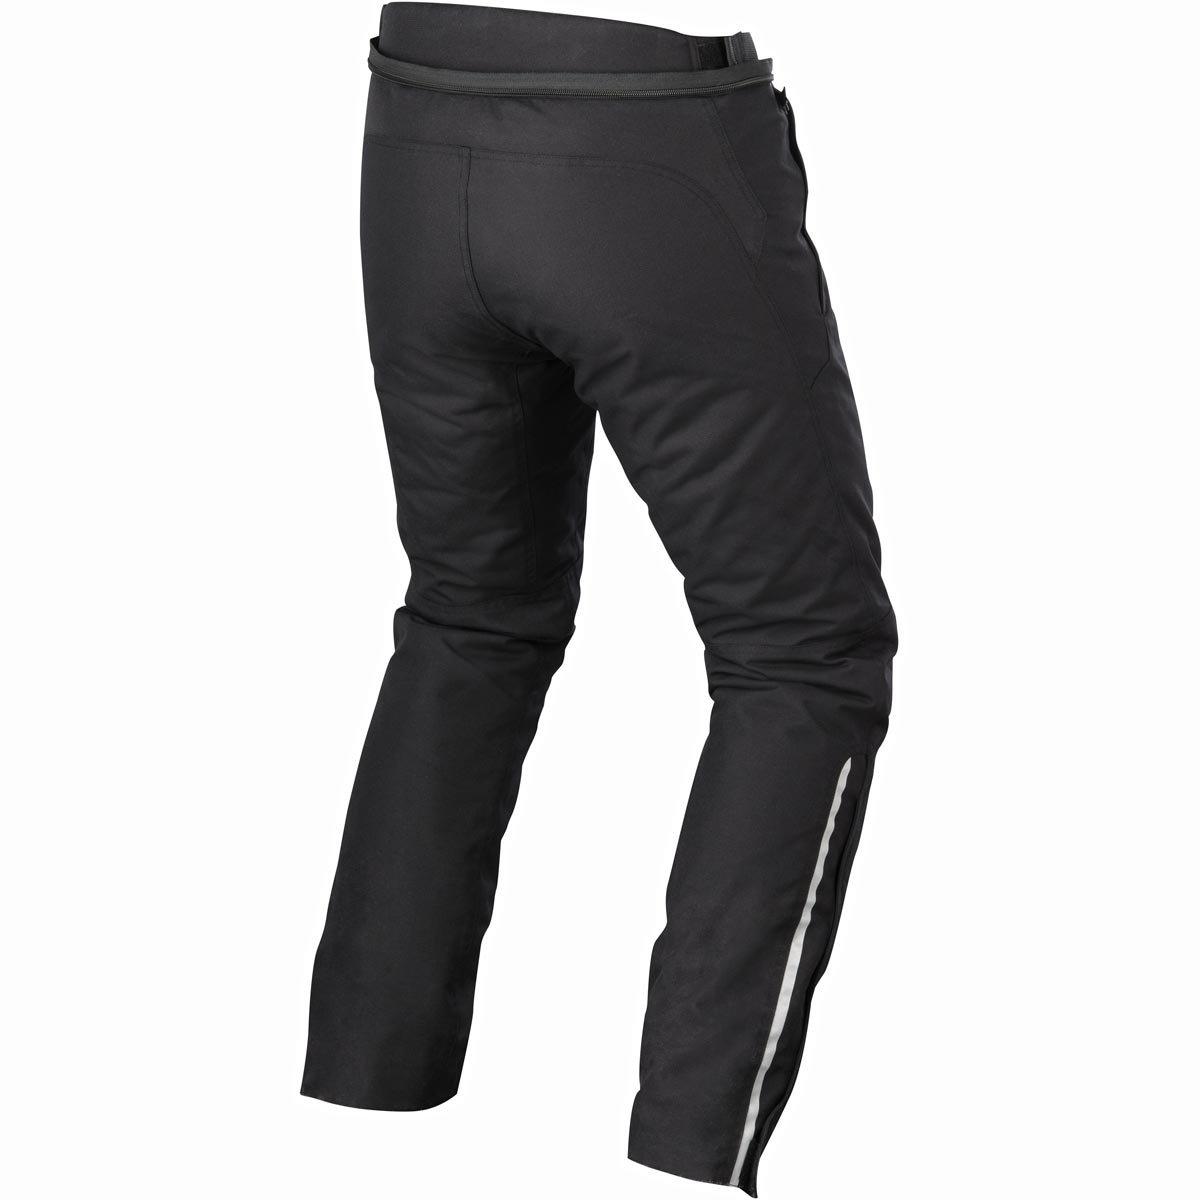 Alpinestars Motorcycle Jeans-Patron Gore-Tex Black Size L